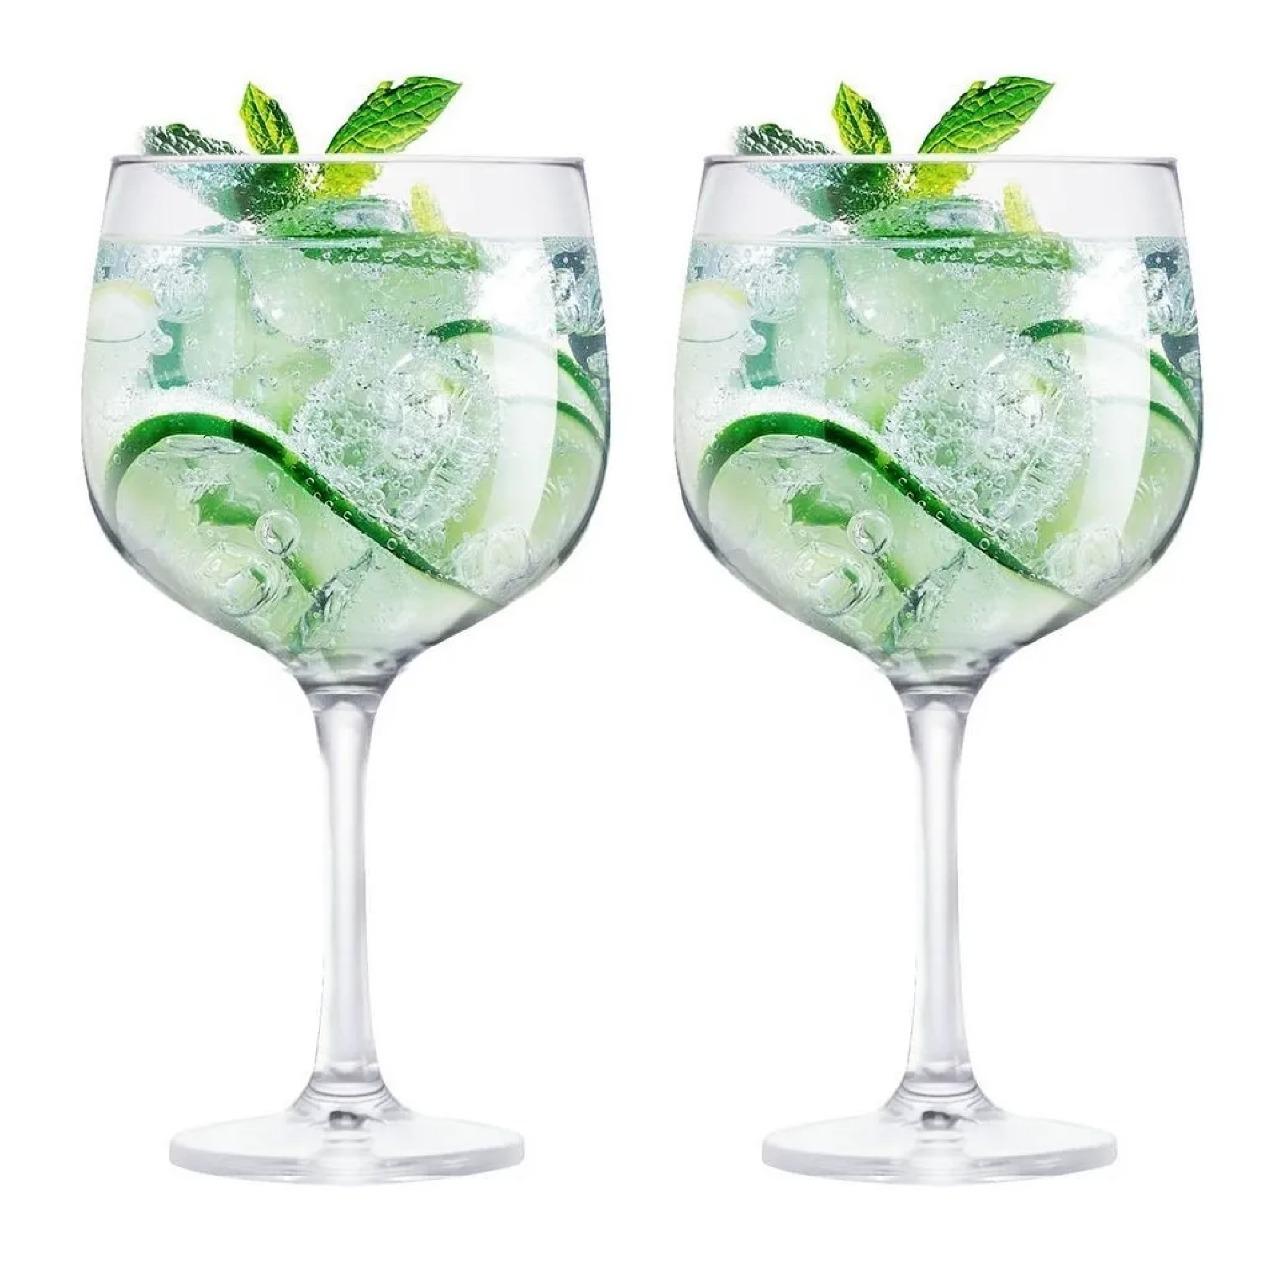 Kit 2 Taças de Gin Tônica em Vidro 650ml